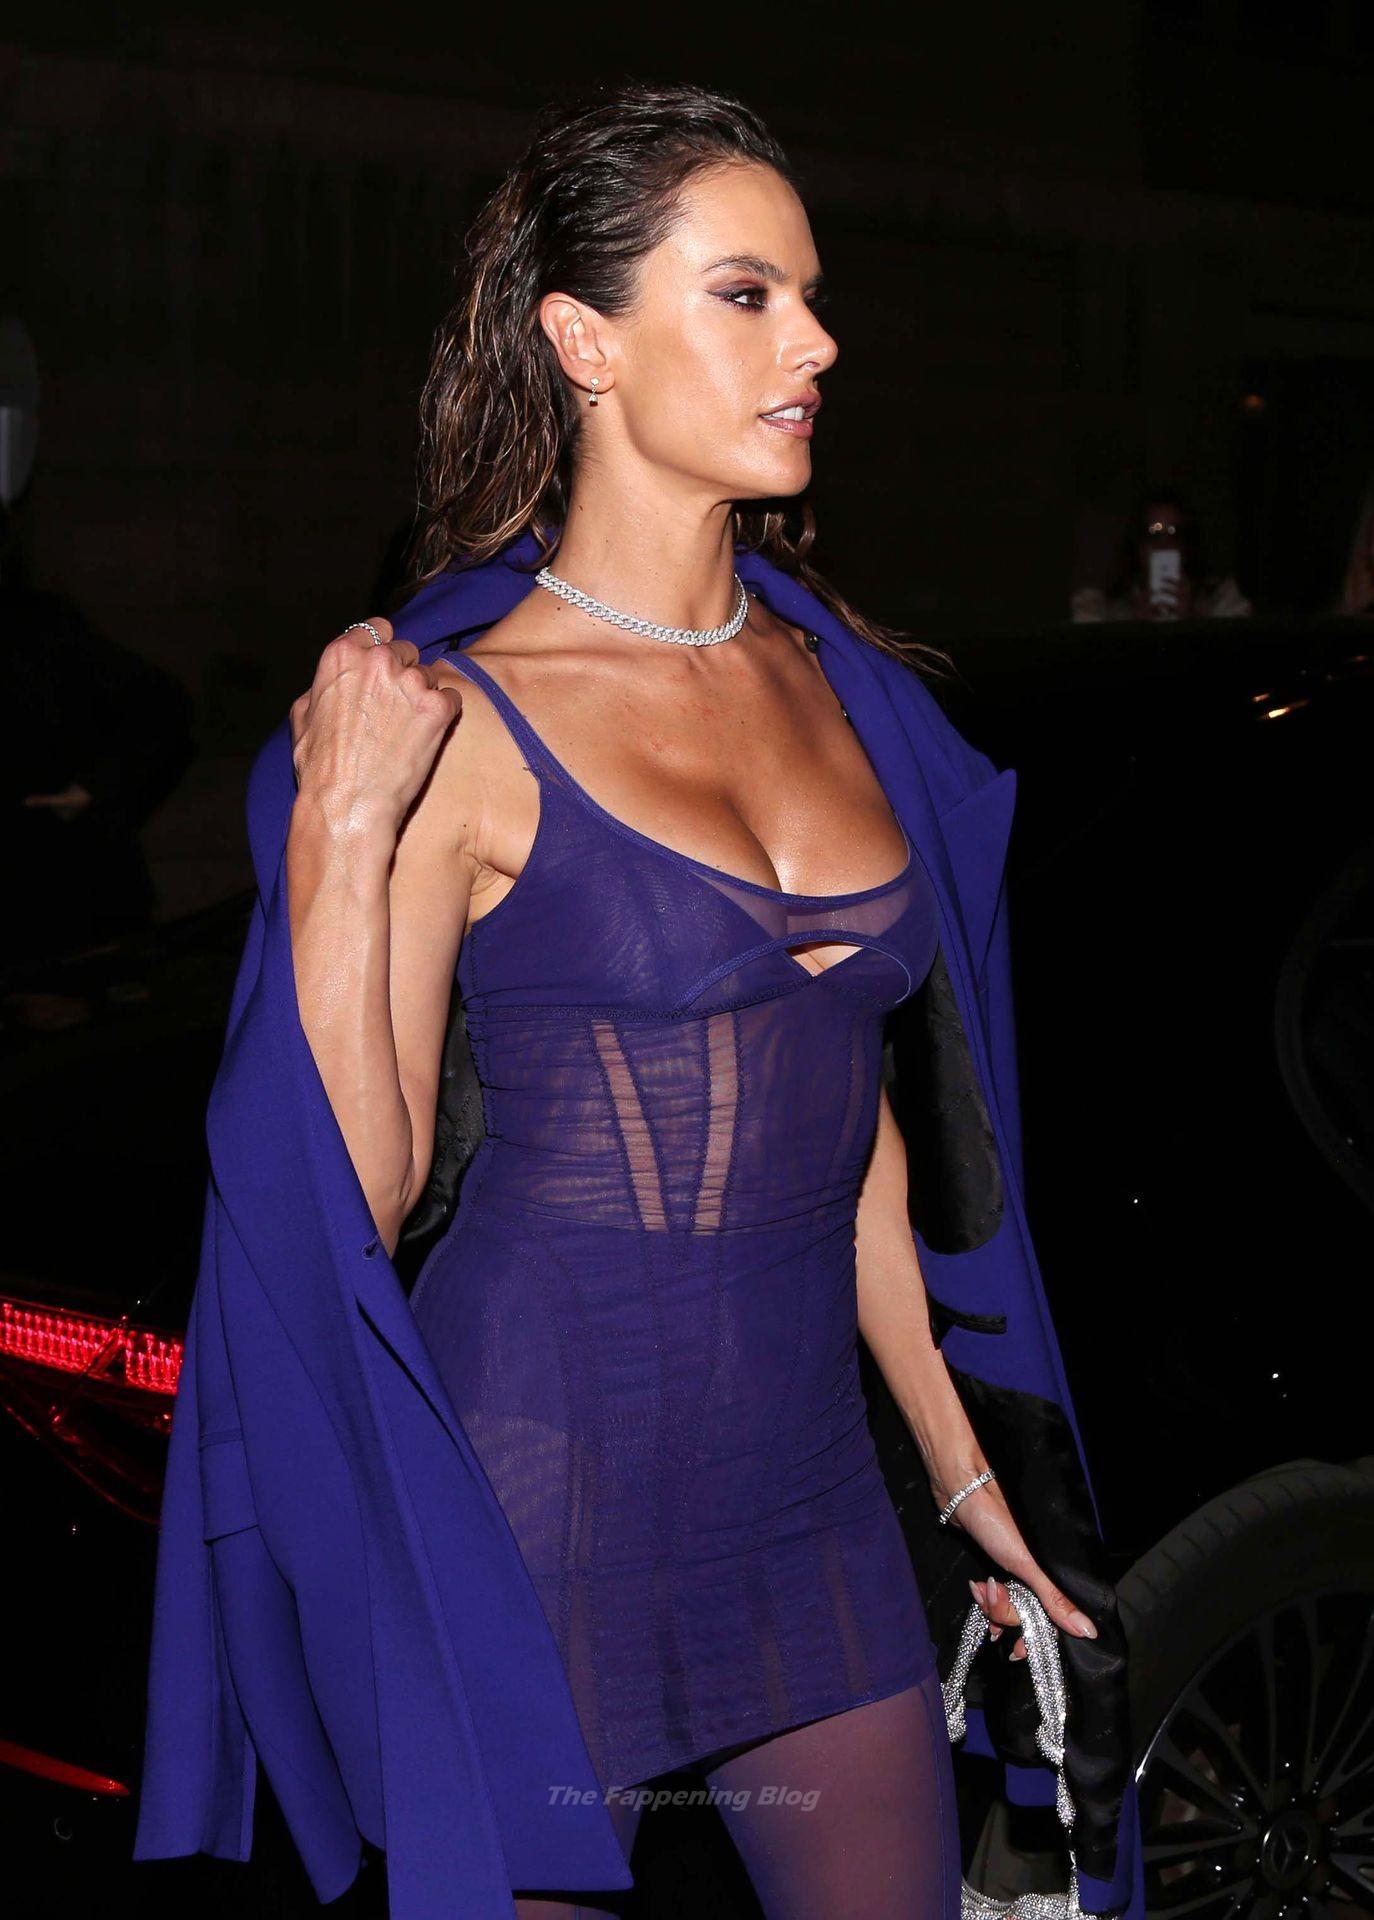 Alessandra-Ambrosio-Sexy-The-Fappening-Blog-94-1.jpg